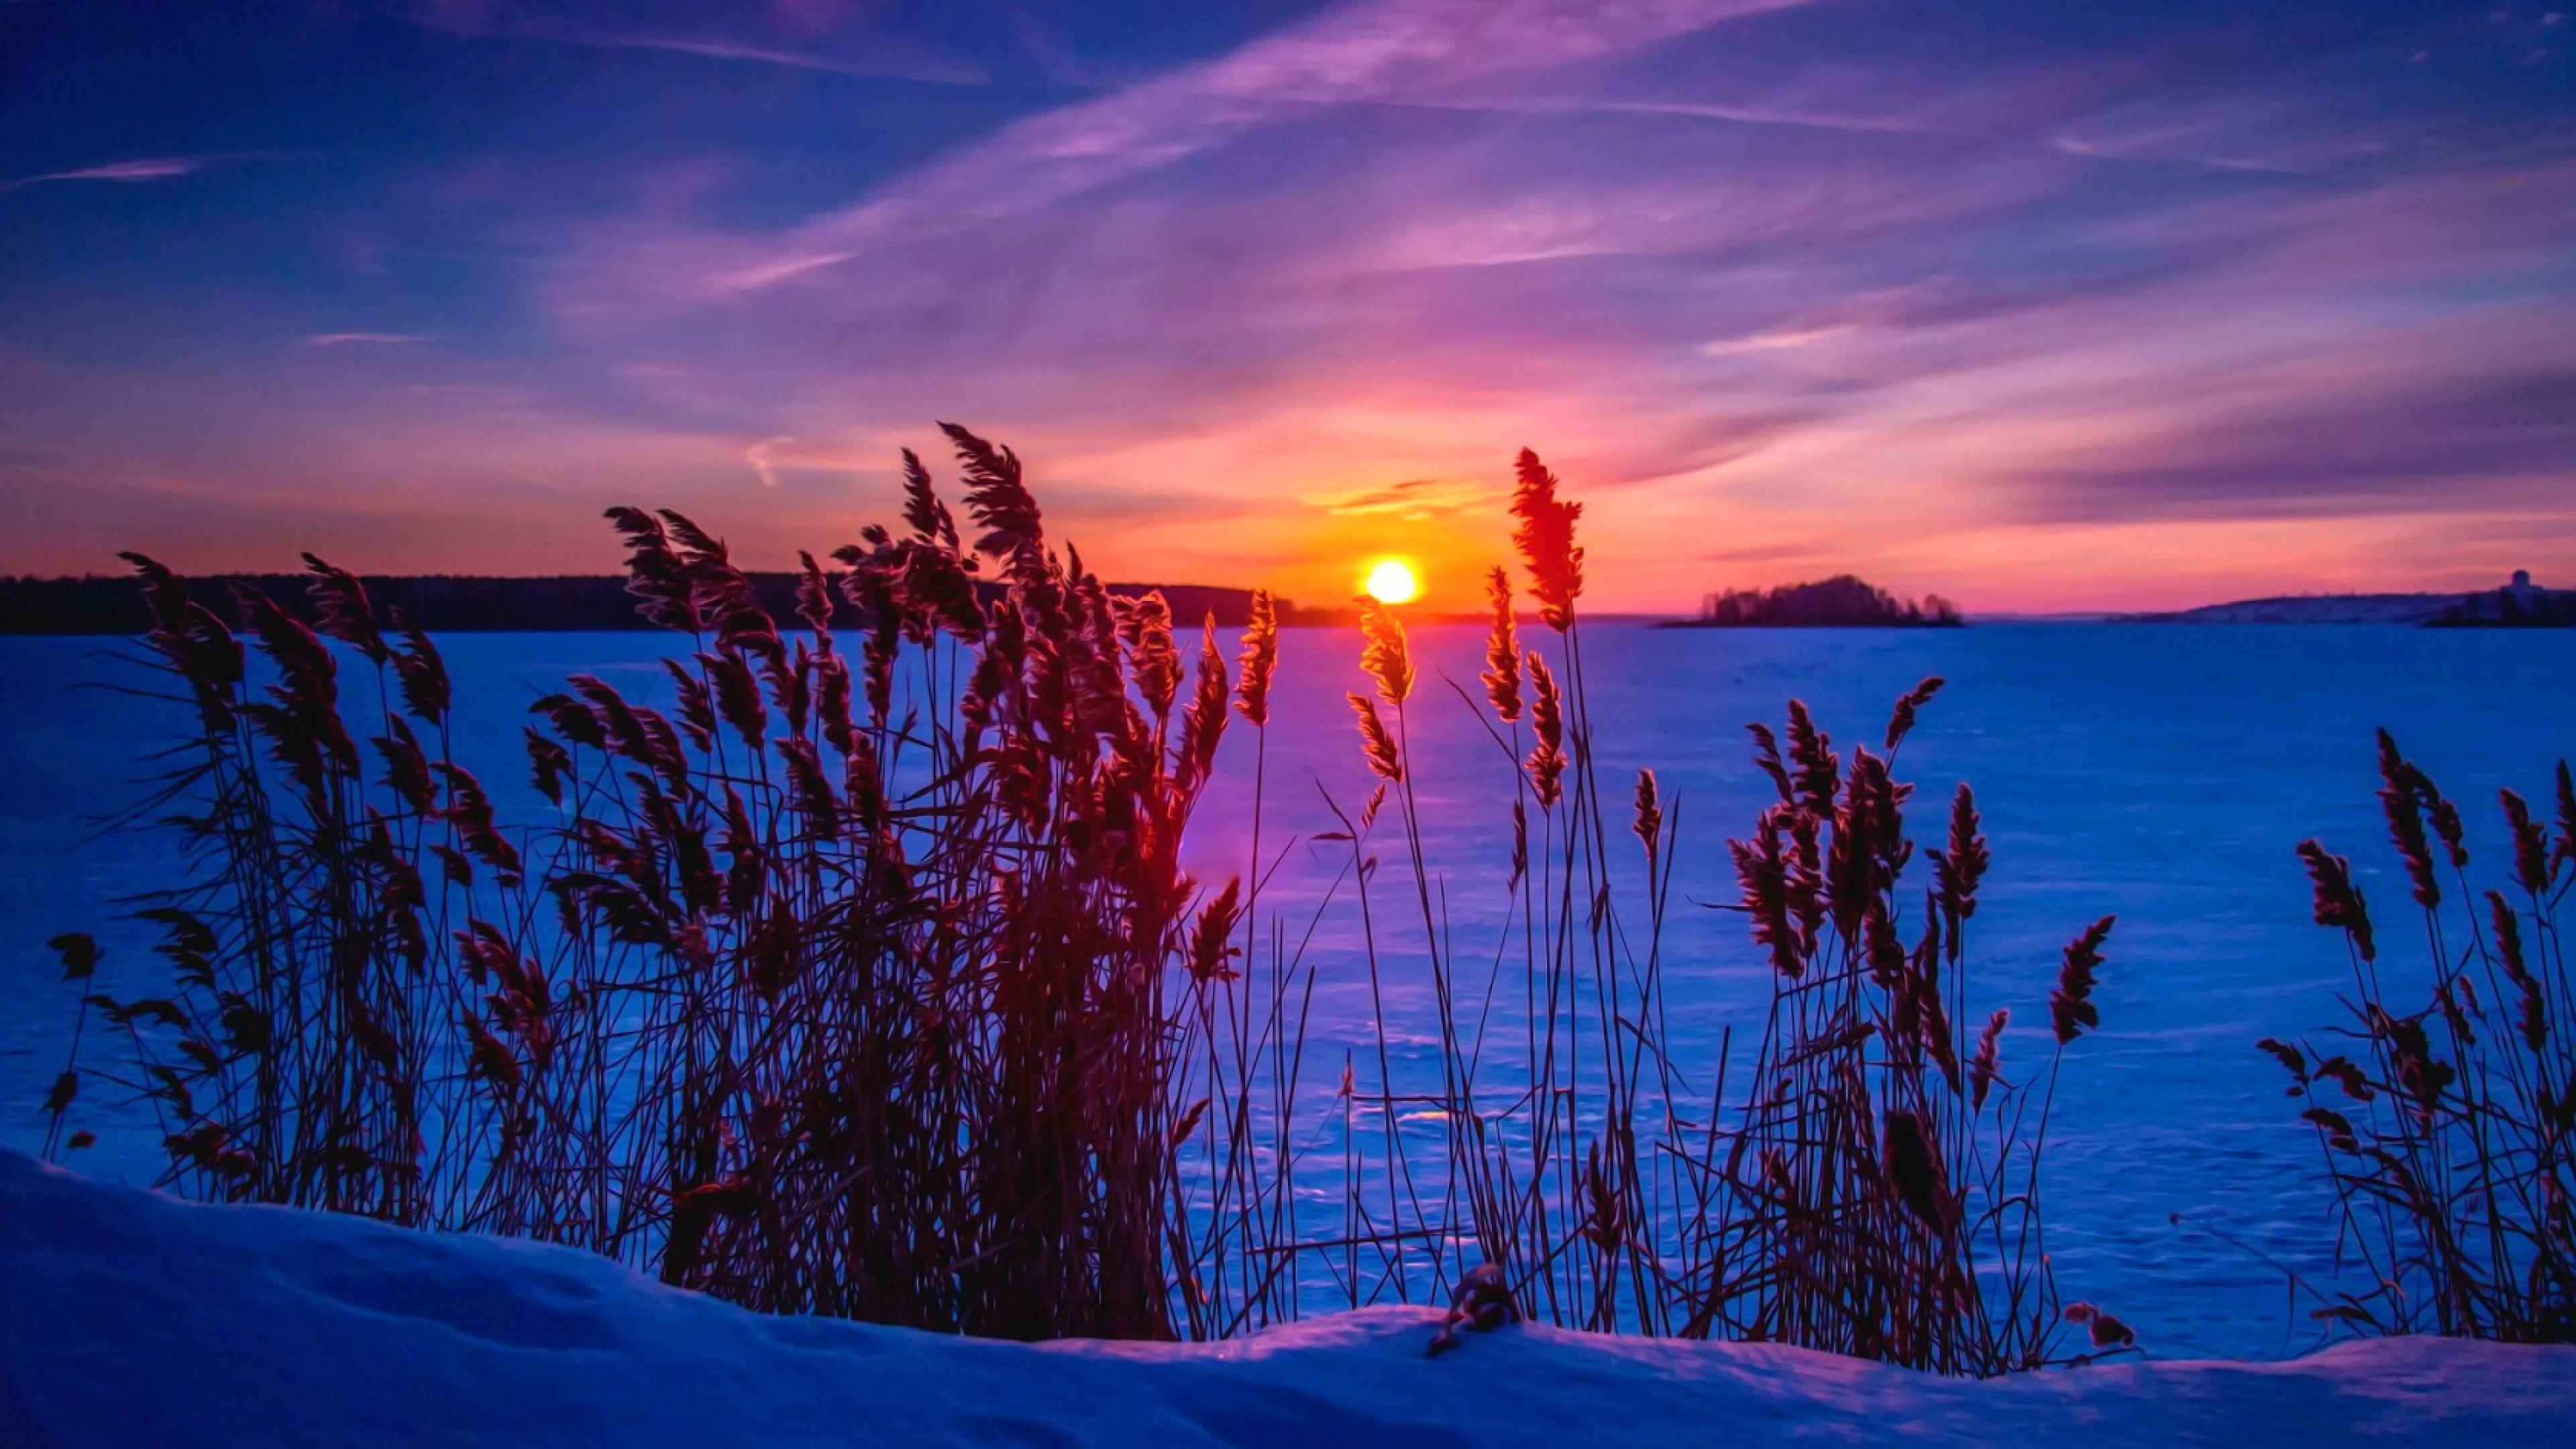 4k Winter Sunset Wallpapers Top Free 4k Winter Sunset Backgrounds Wallpaperaccess